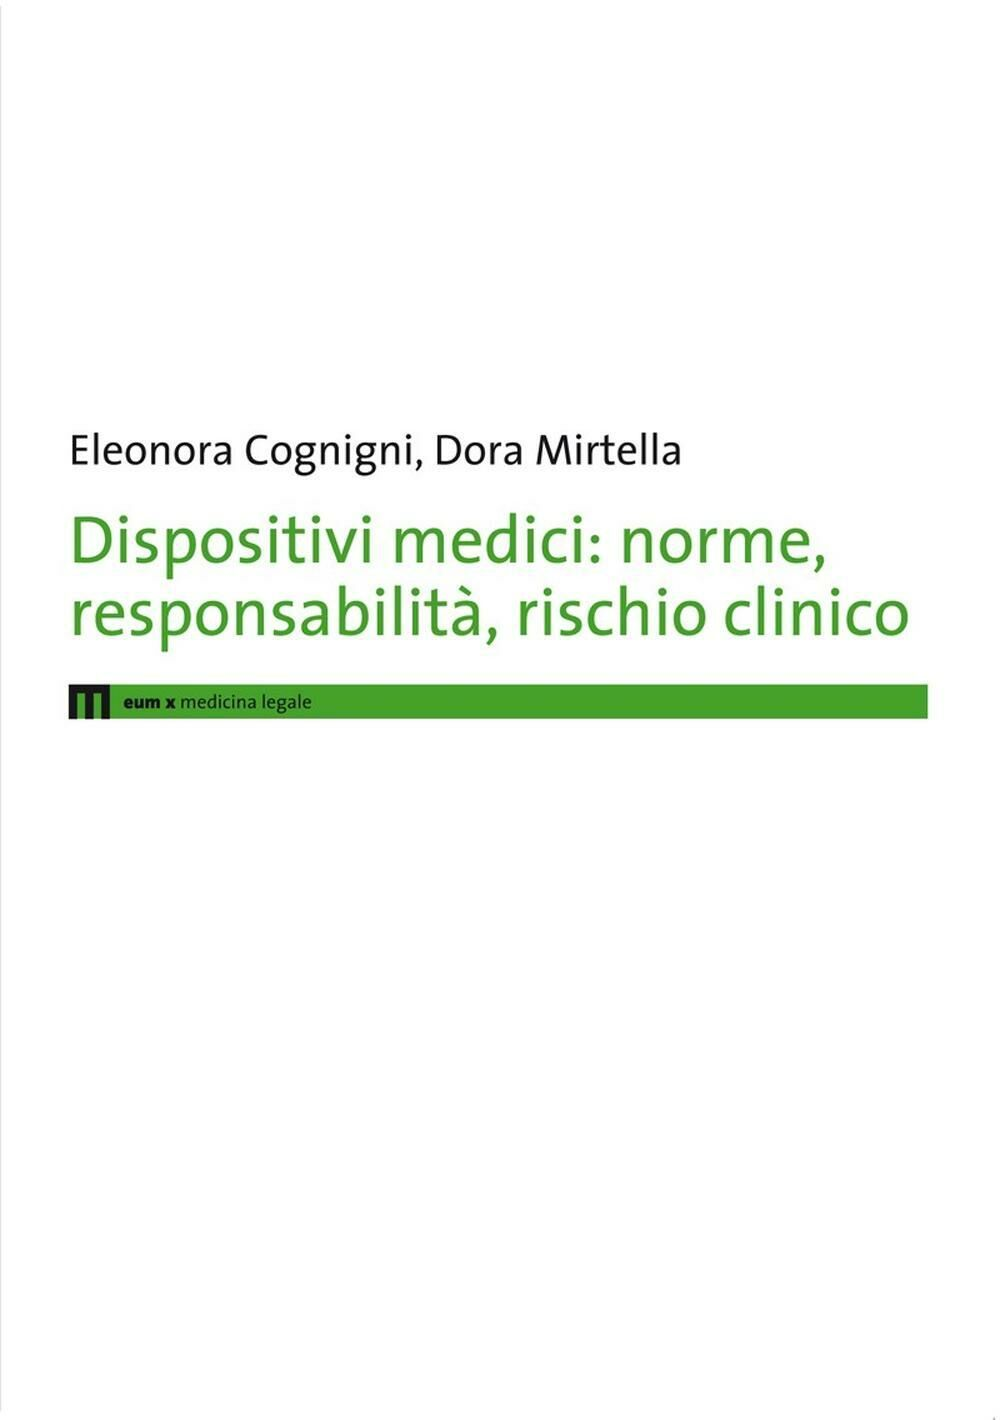 Dispositivi medici. Norme, responsabilità, rischio clinico